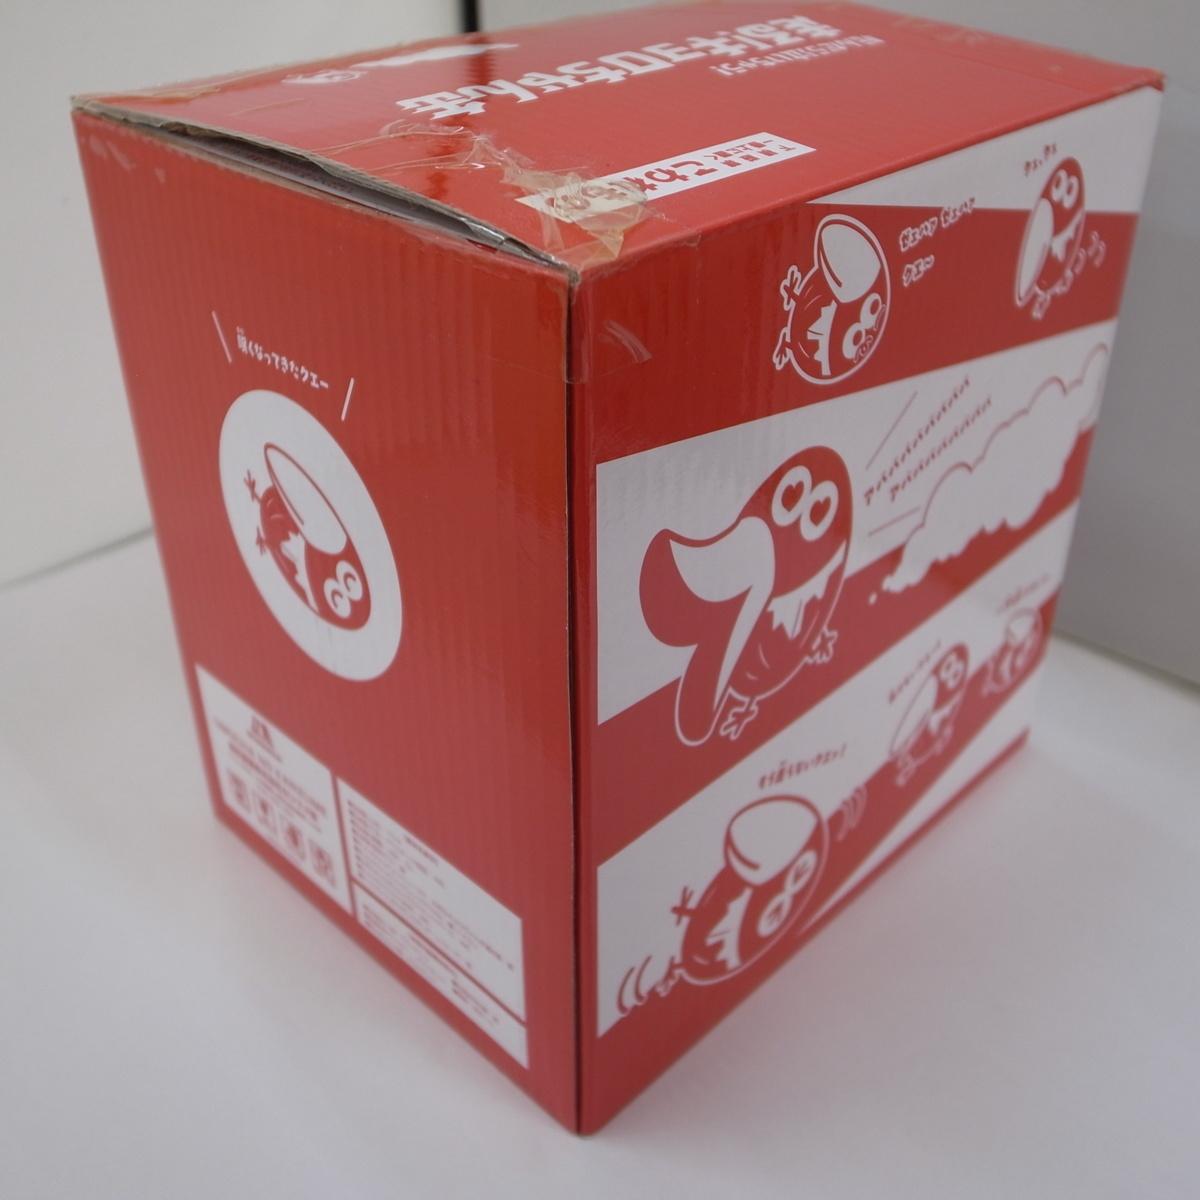 6362T【本物保証】未開封 走る キョロちゃん缶 金のエンゼル 銀のエンゼル おもちゃのカンヅメ 森永チョコボール_画像2